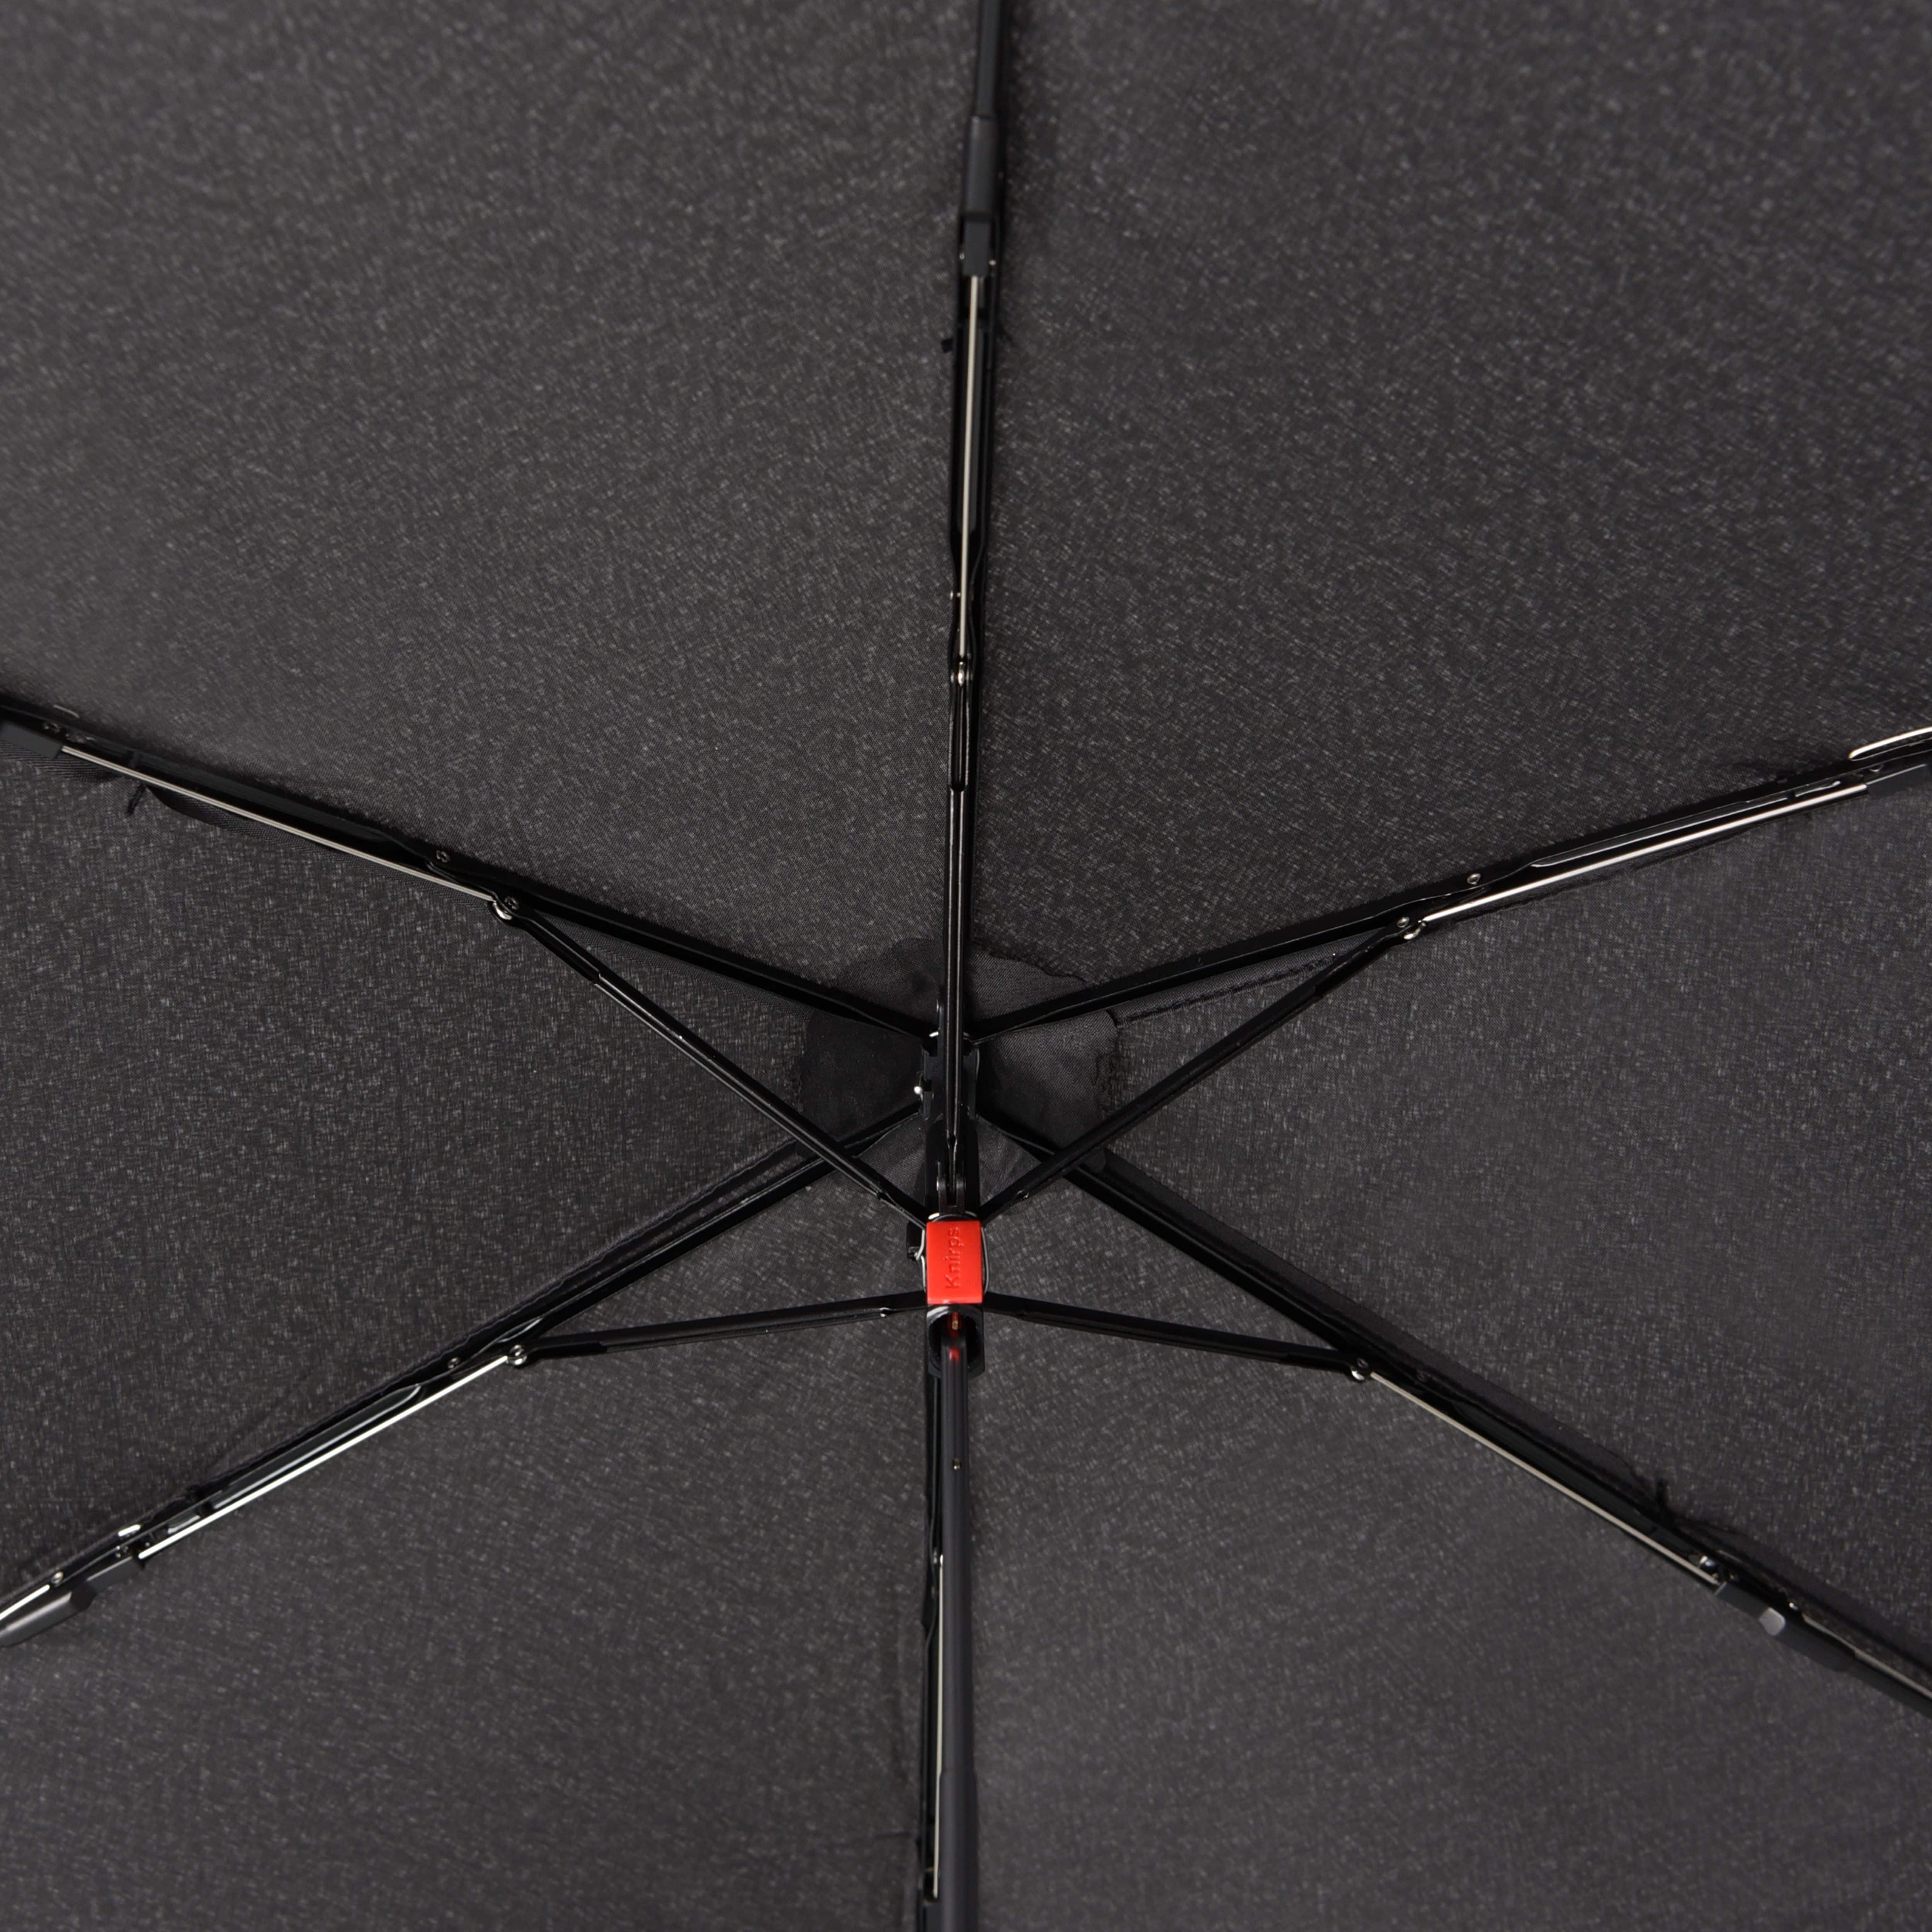 Knirps Umbrella AS.050 slim small manual - photo 4